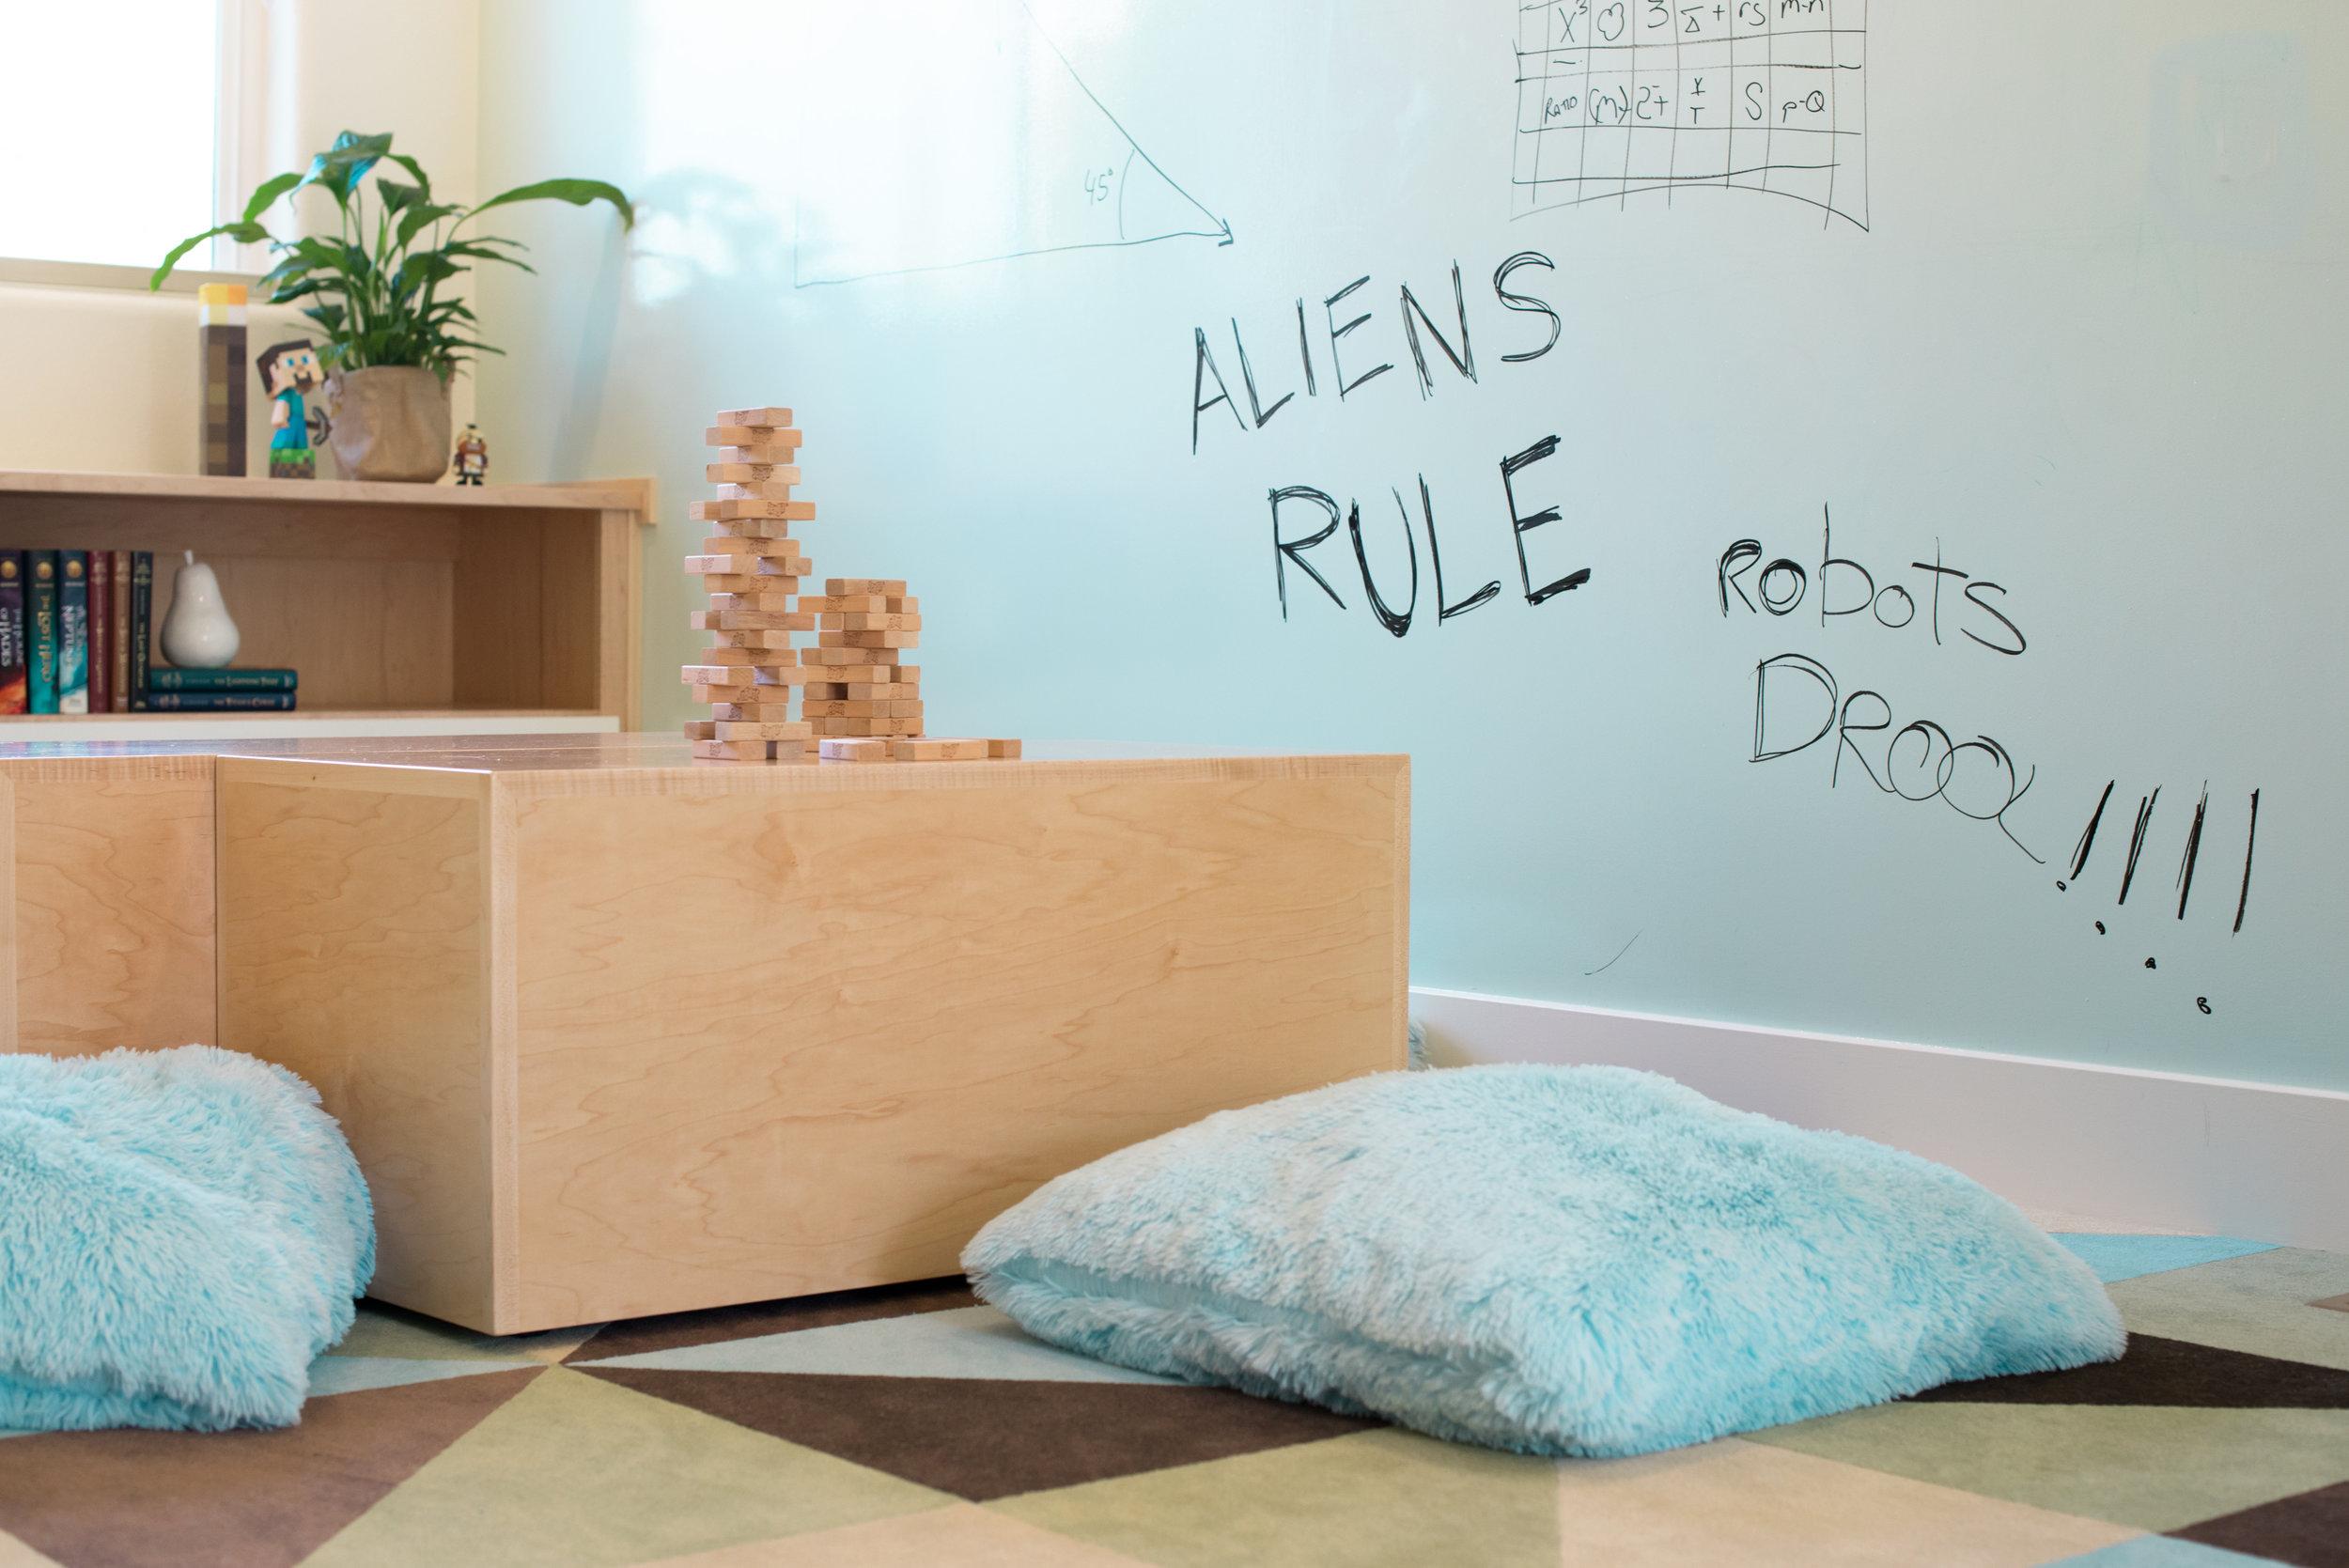 Playroom and bonus room renovation and interior design - Reno, Nevada - Kovac Design